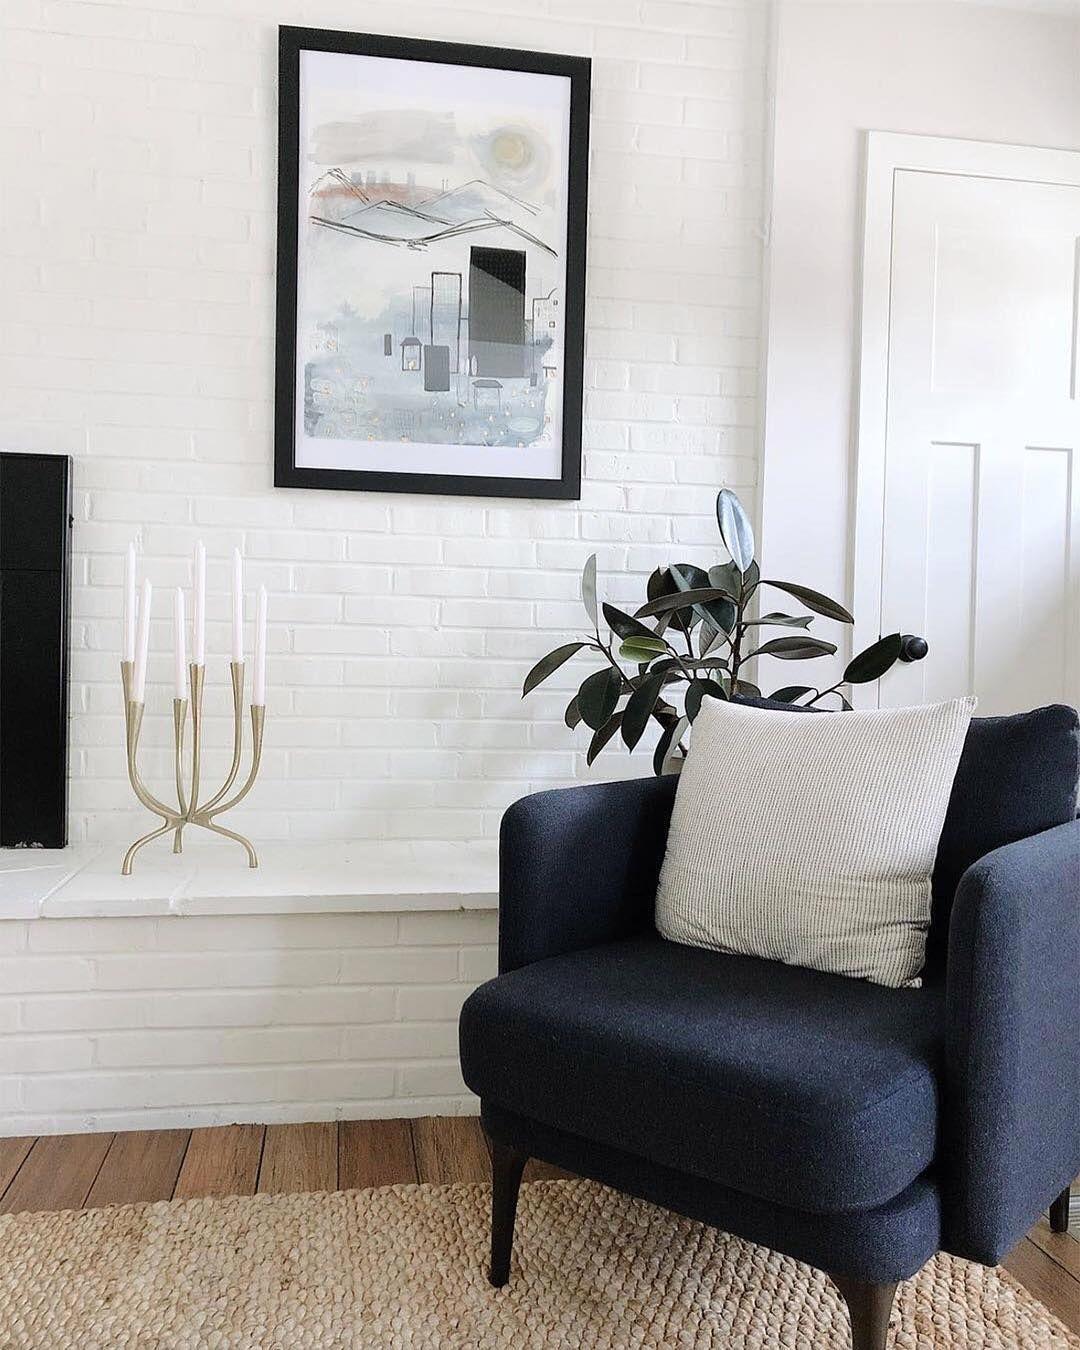 West Elm On Instagram Convenience Meet Comfort The Auburn Chair Is A Fan Favorite For Its E Side Chairs Living Room West Elm Living Room West Elm Furniture #west #elm #living #room #chairs